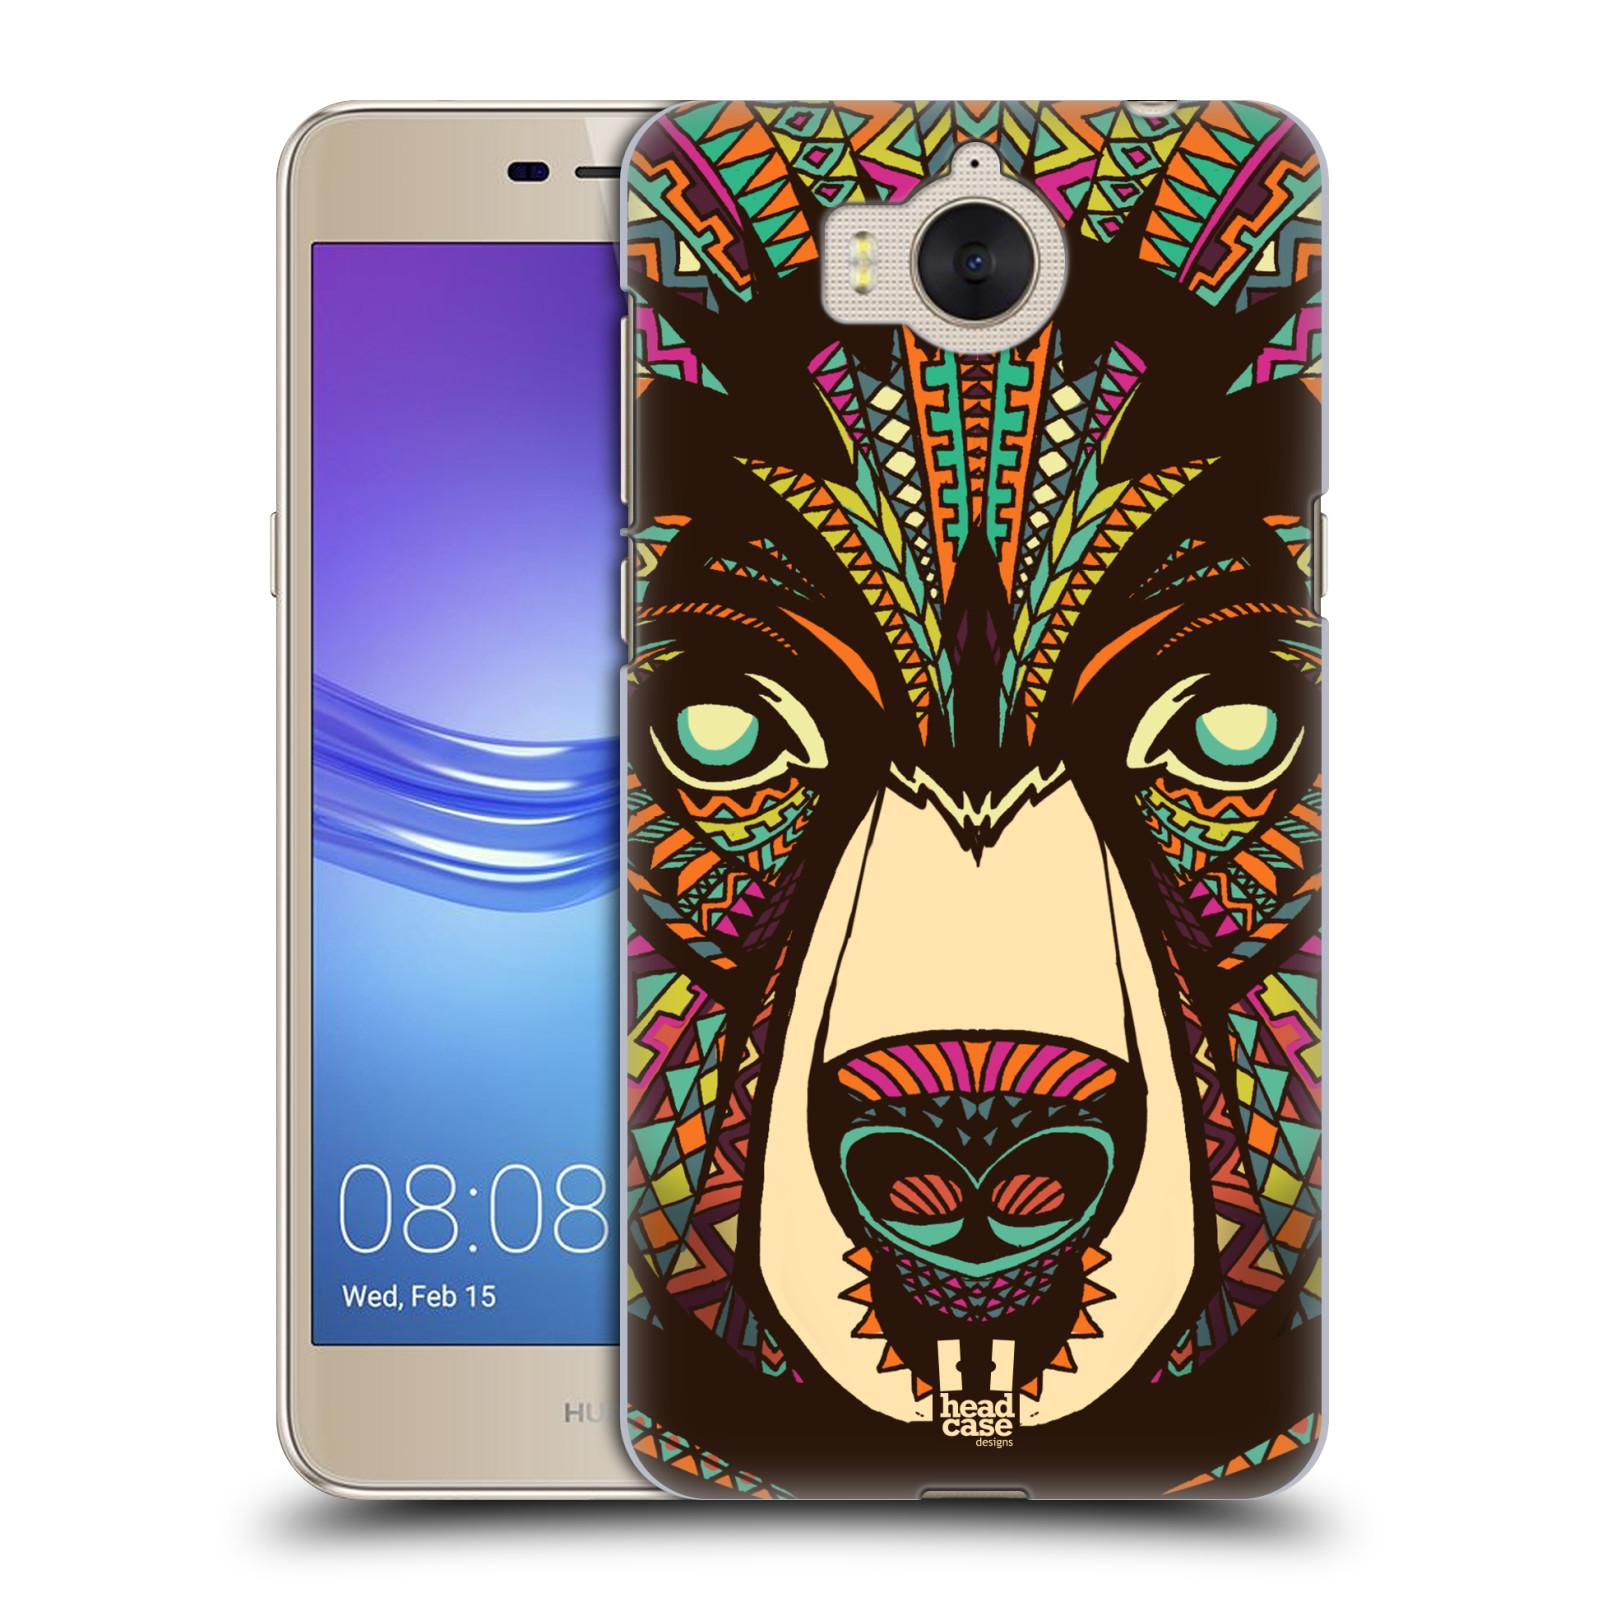 Plastové pouzdro na mobil Huawei Y6 2017 - Head Case - AZTEC MEDVĚD